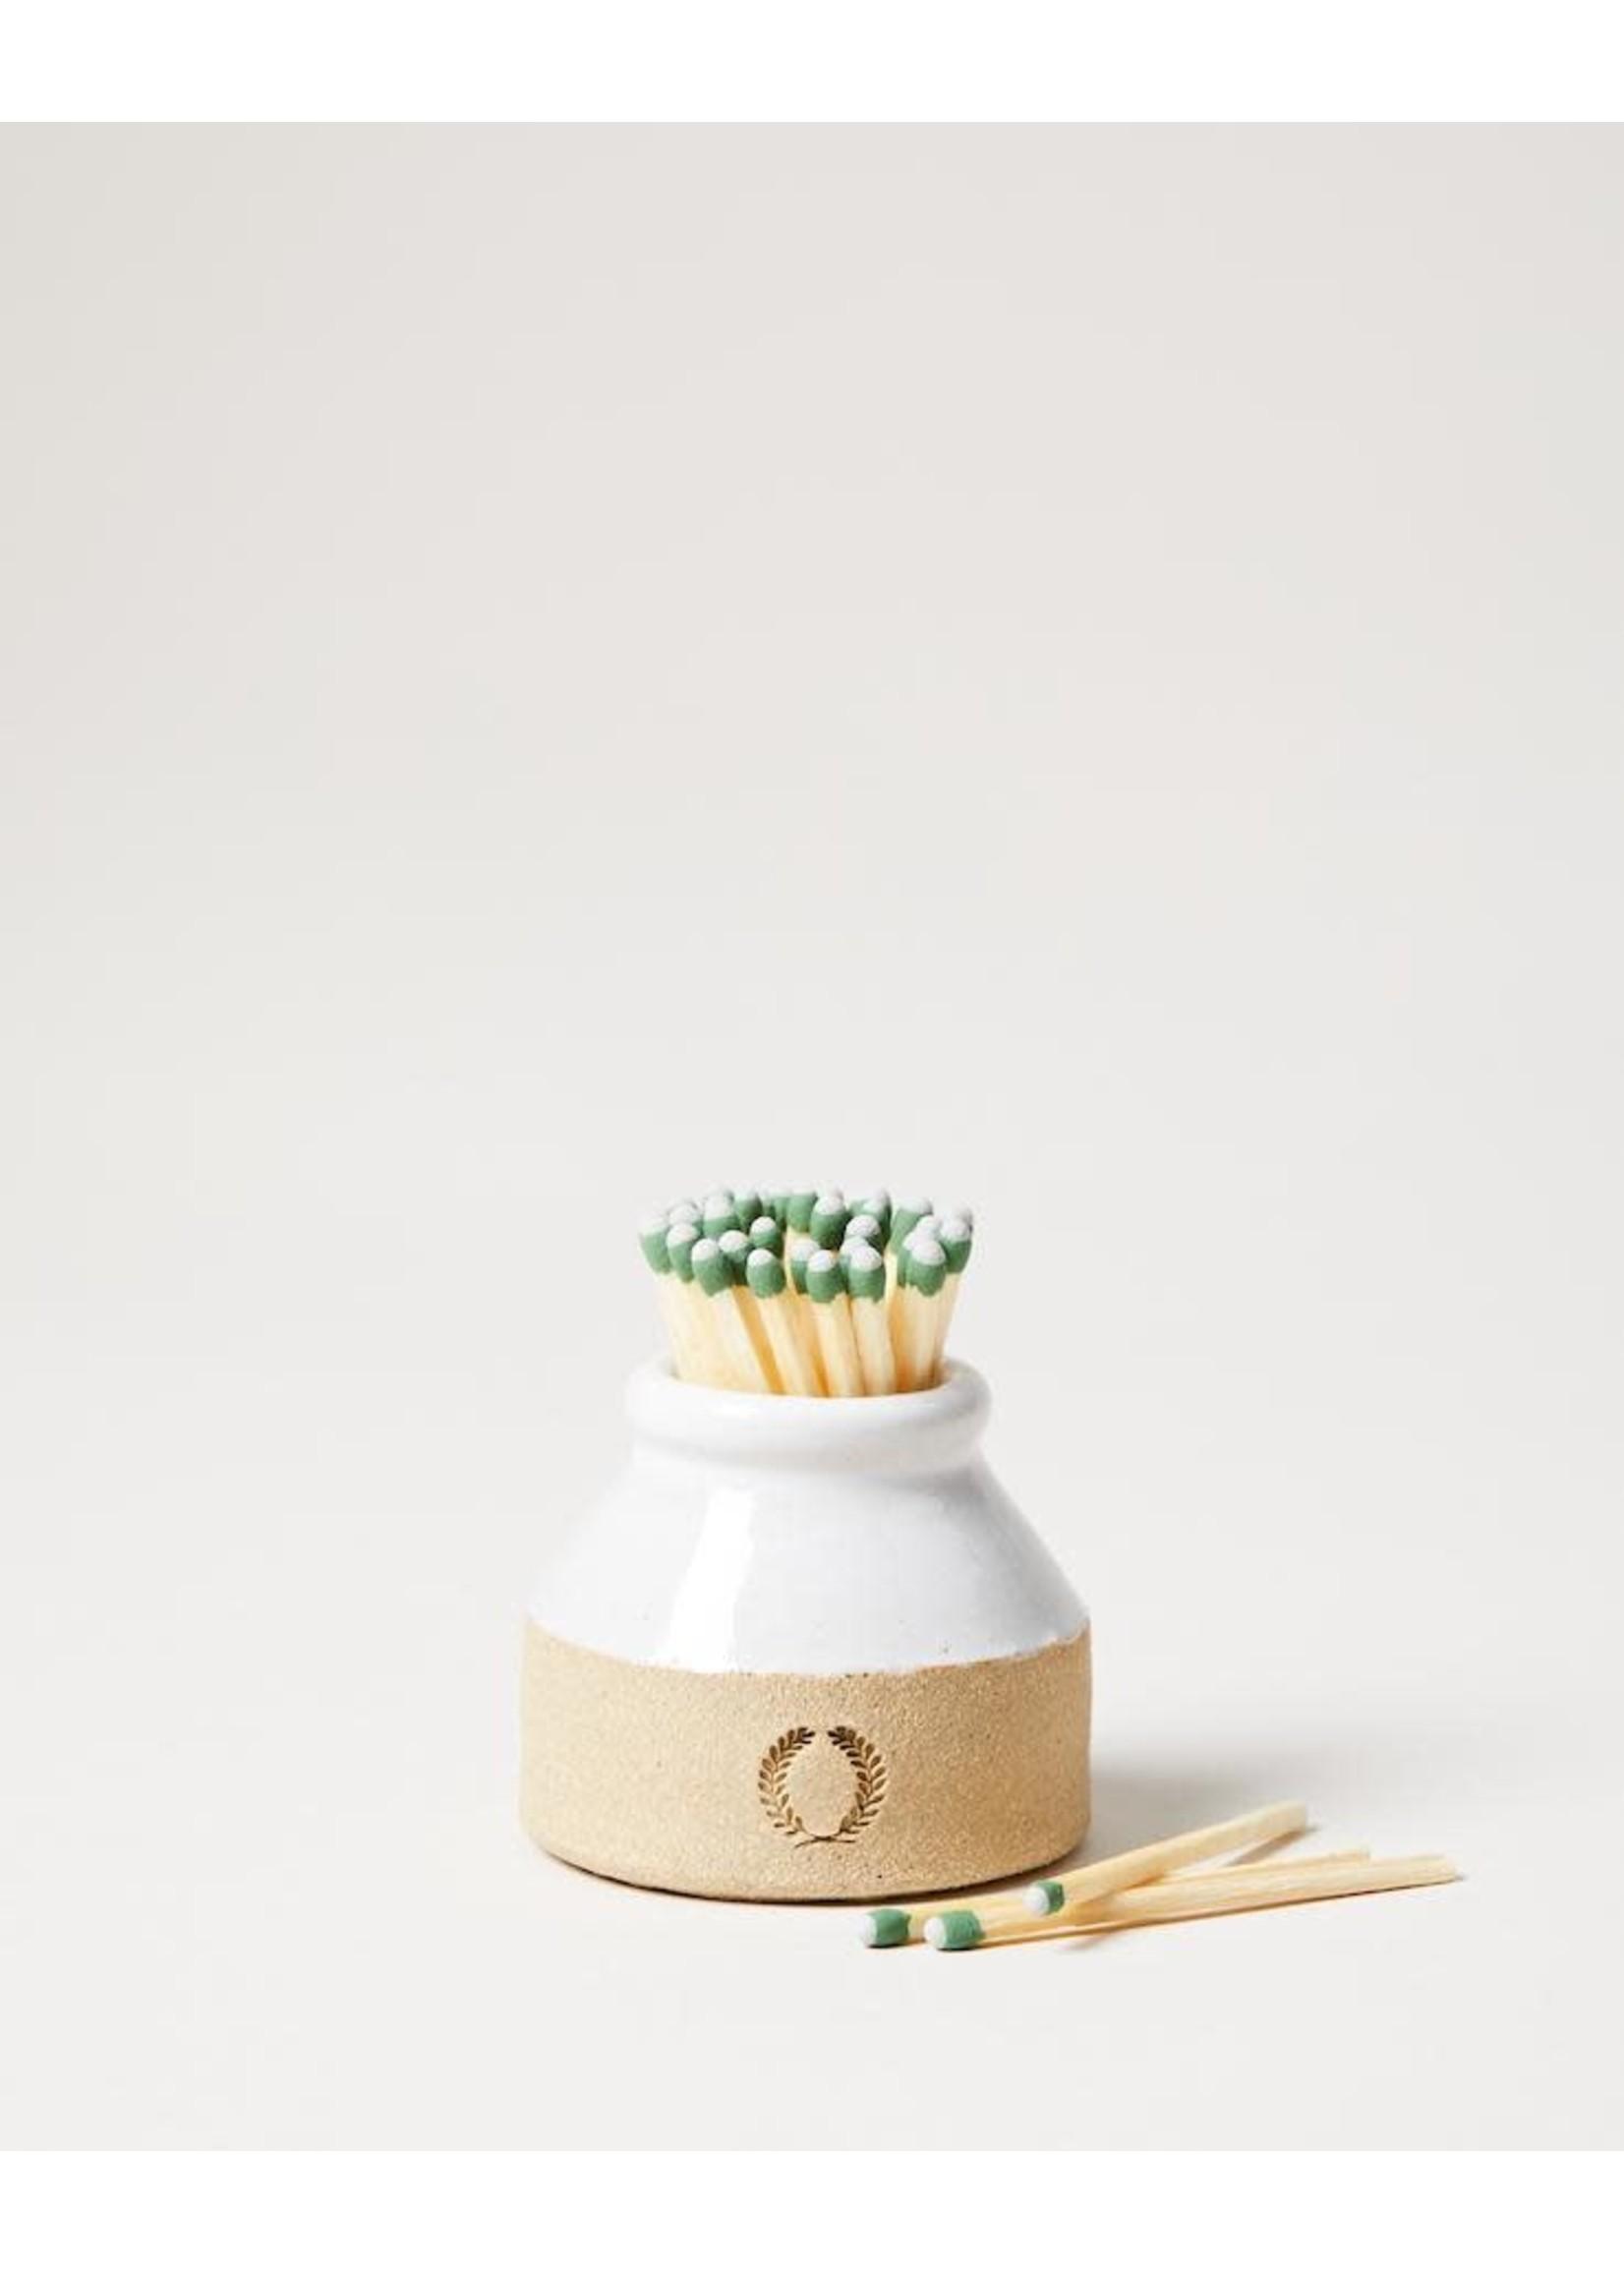 Farmhouse Pottery Match Striker - Milk Bottle